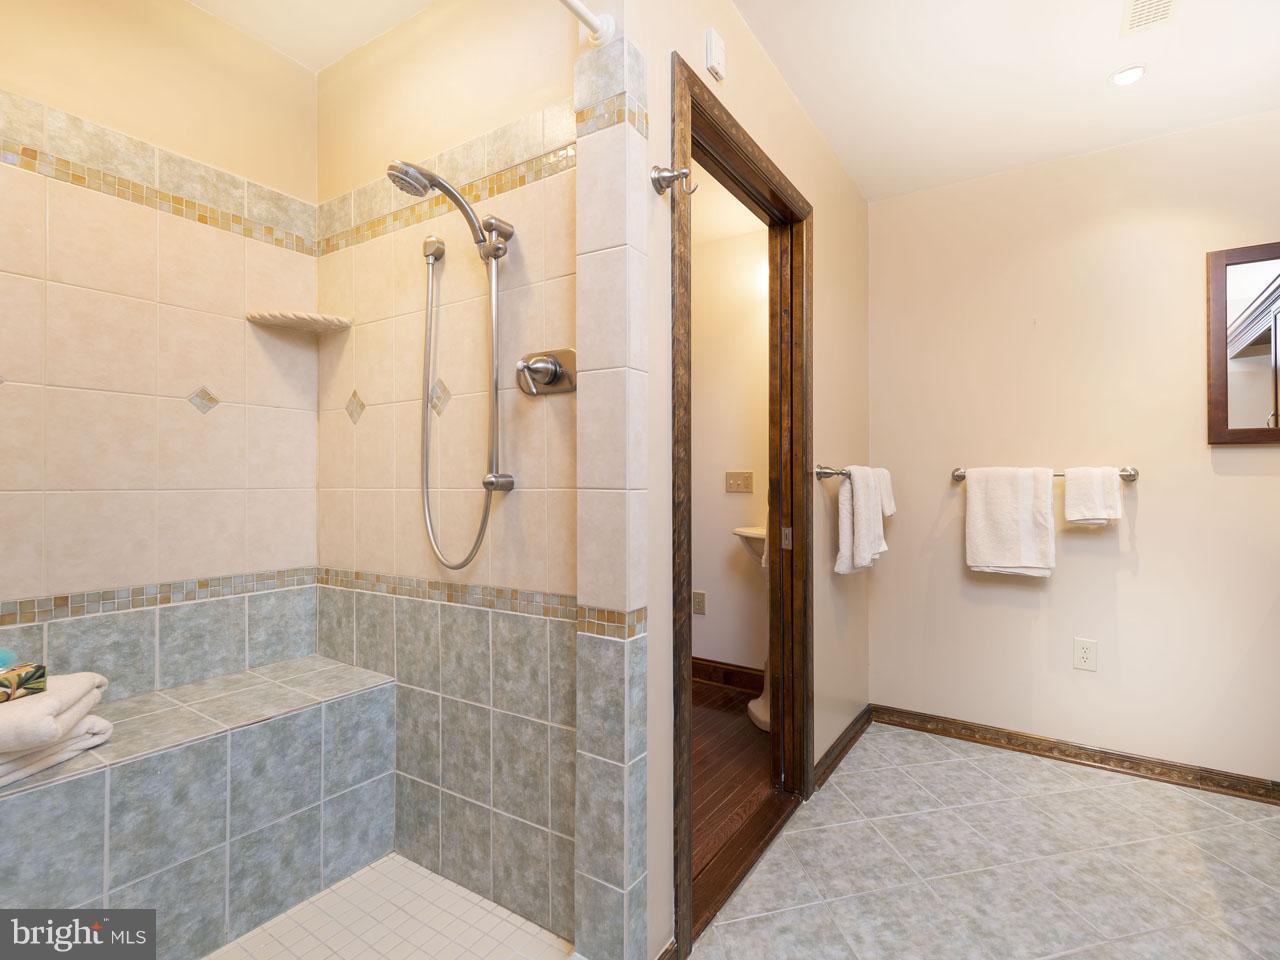 1002303700-300502417943-2021-07-22-03-27-22  |   | Alexandria Delaware Real Estate For Sale | MLS# 1002303700  - Best of Northern Virginia